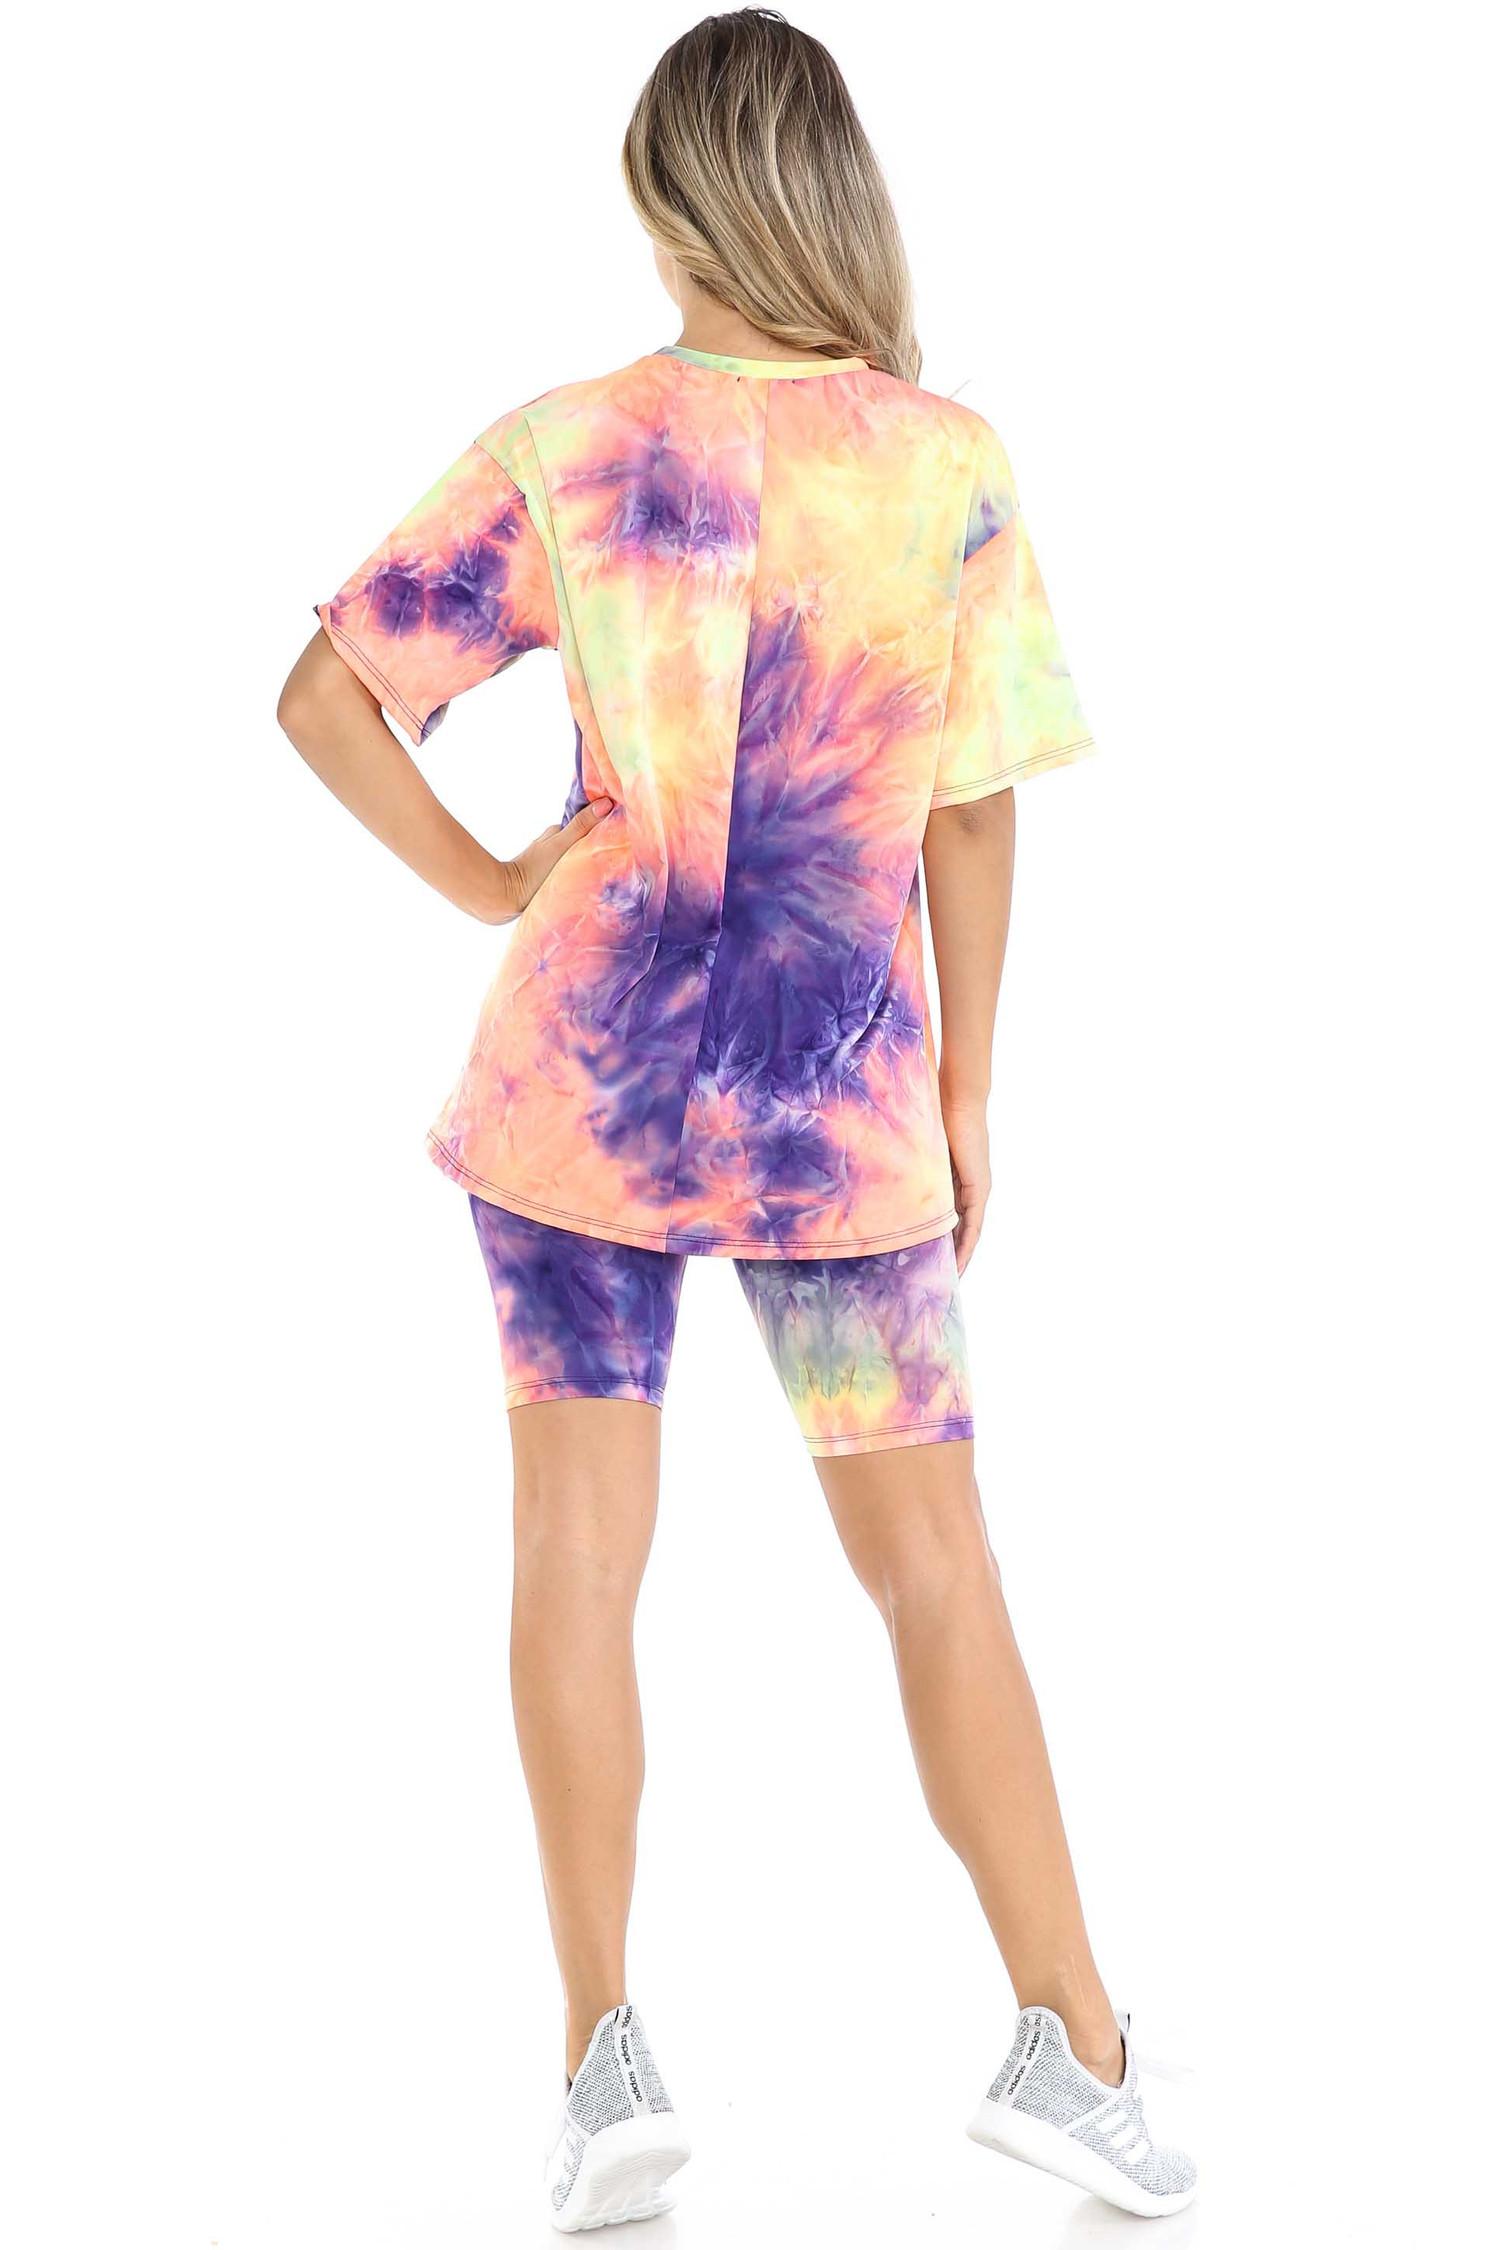 Indigo Tie Dye 2 Piece Shorts and T-Shirt Set